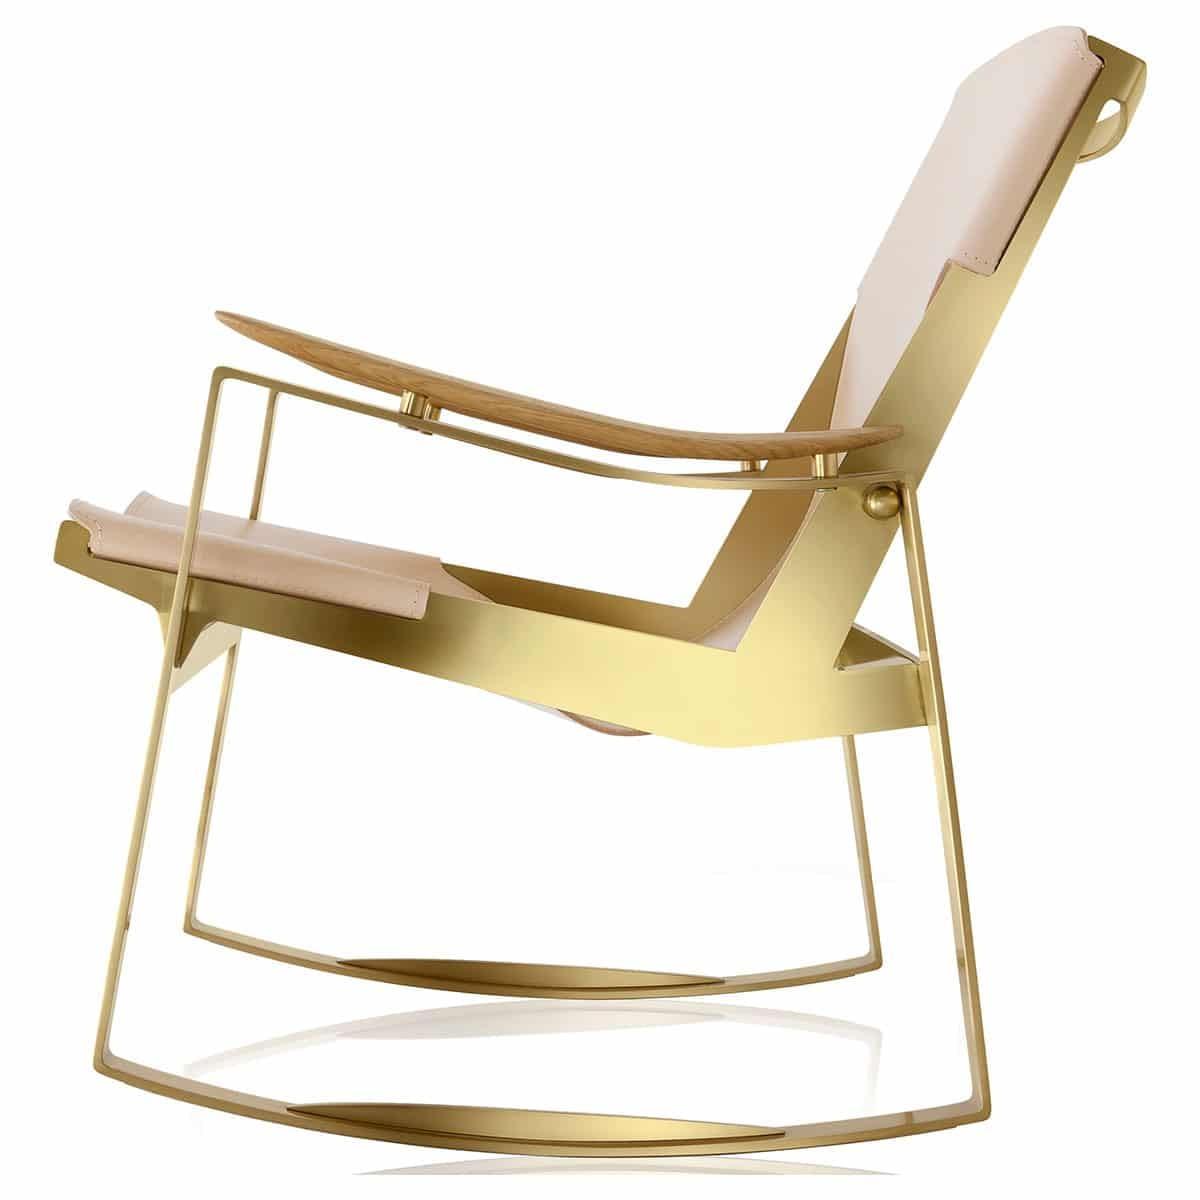 Designer Jader Almeidal Design Licce Armchair Chair